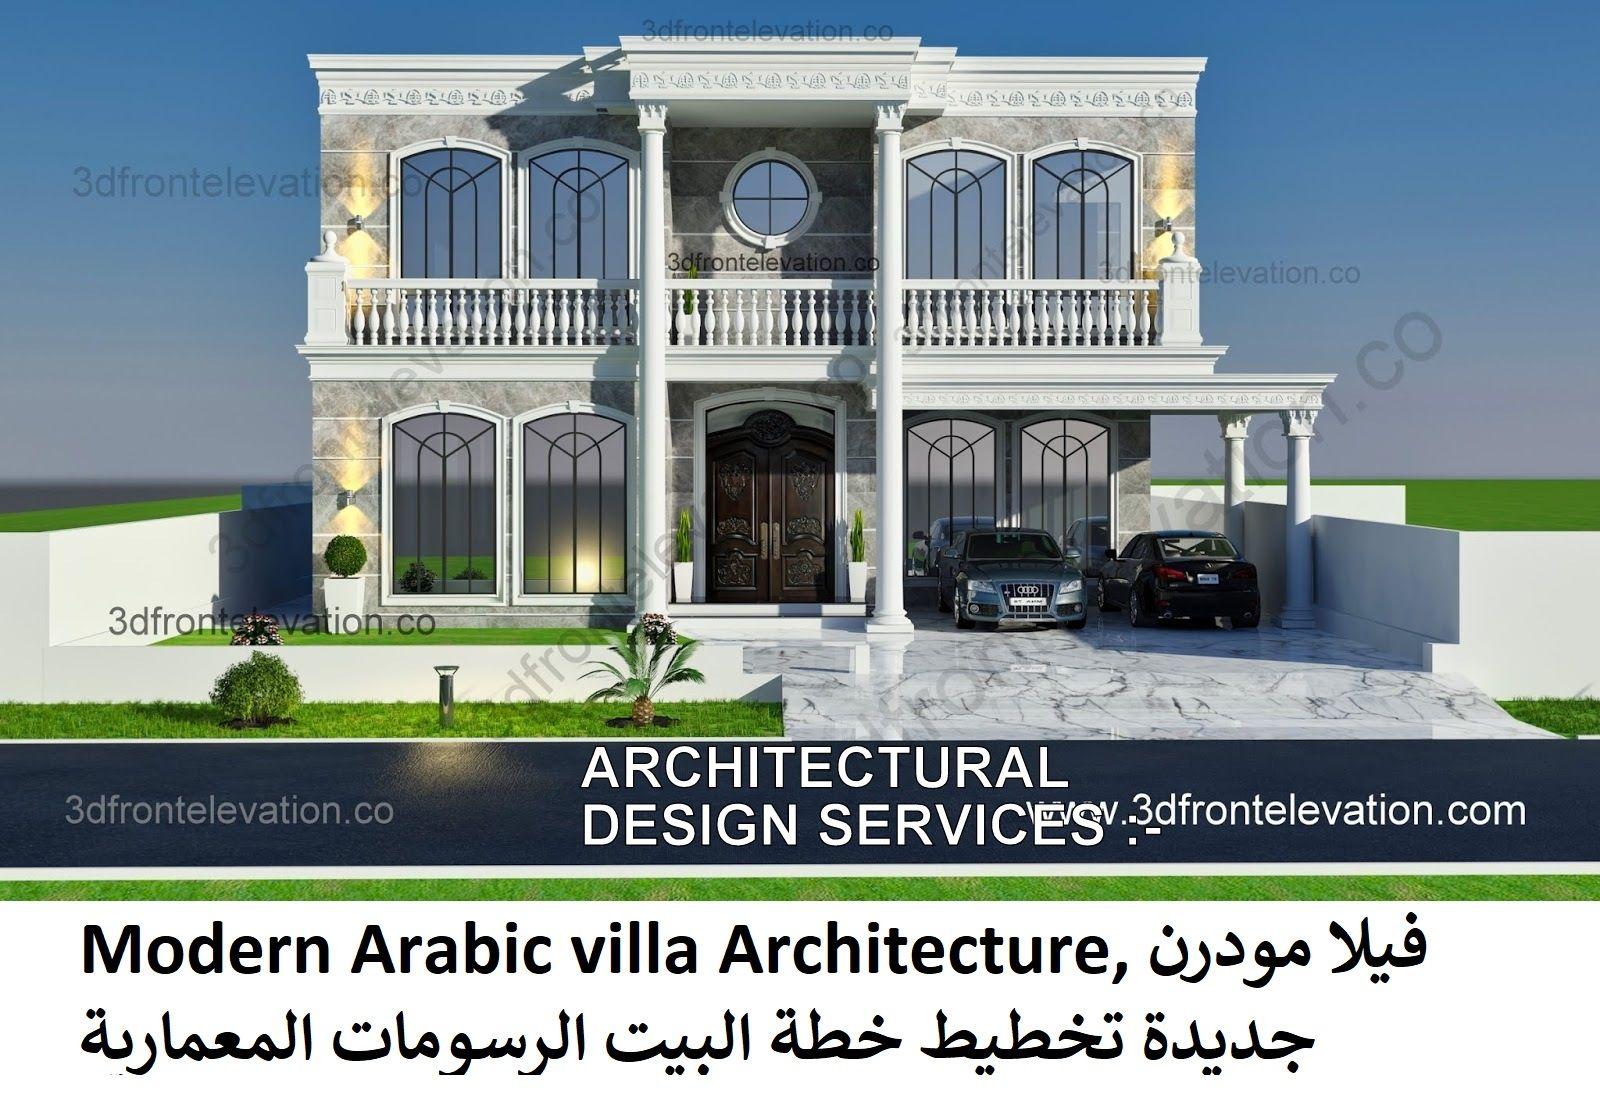 Modern Arabic Villa Architecture فيلا مودرن جديدة تخطيط خطة البيت الرسومات المعمارية سلطنة عمان House Exterior House Design Design